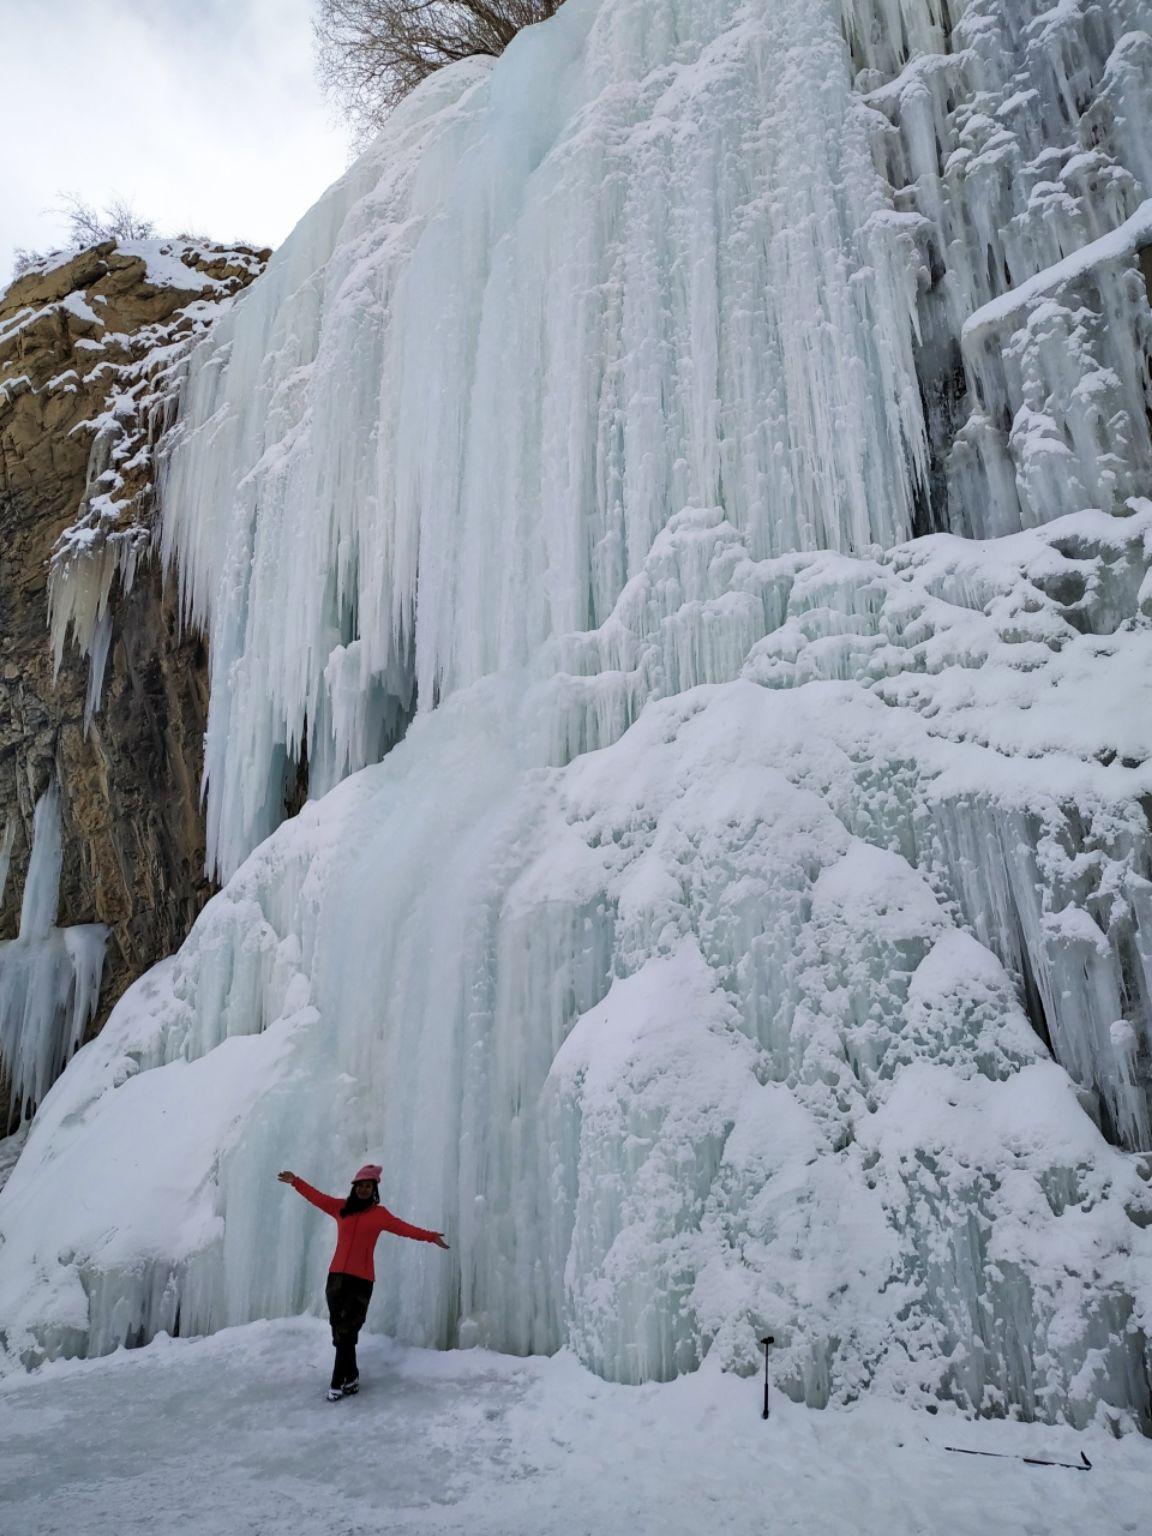 Photo of Chadar trek - Trekking In Ladakh - Frozen River Trekking In Ladakh By Ayushi Jain